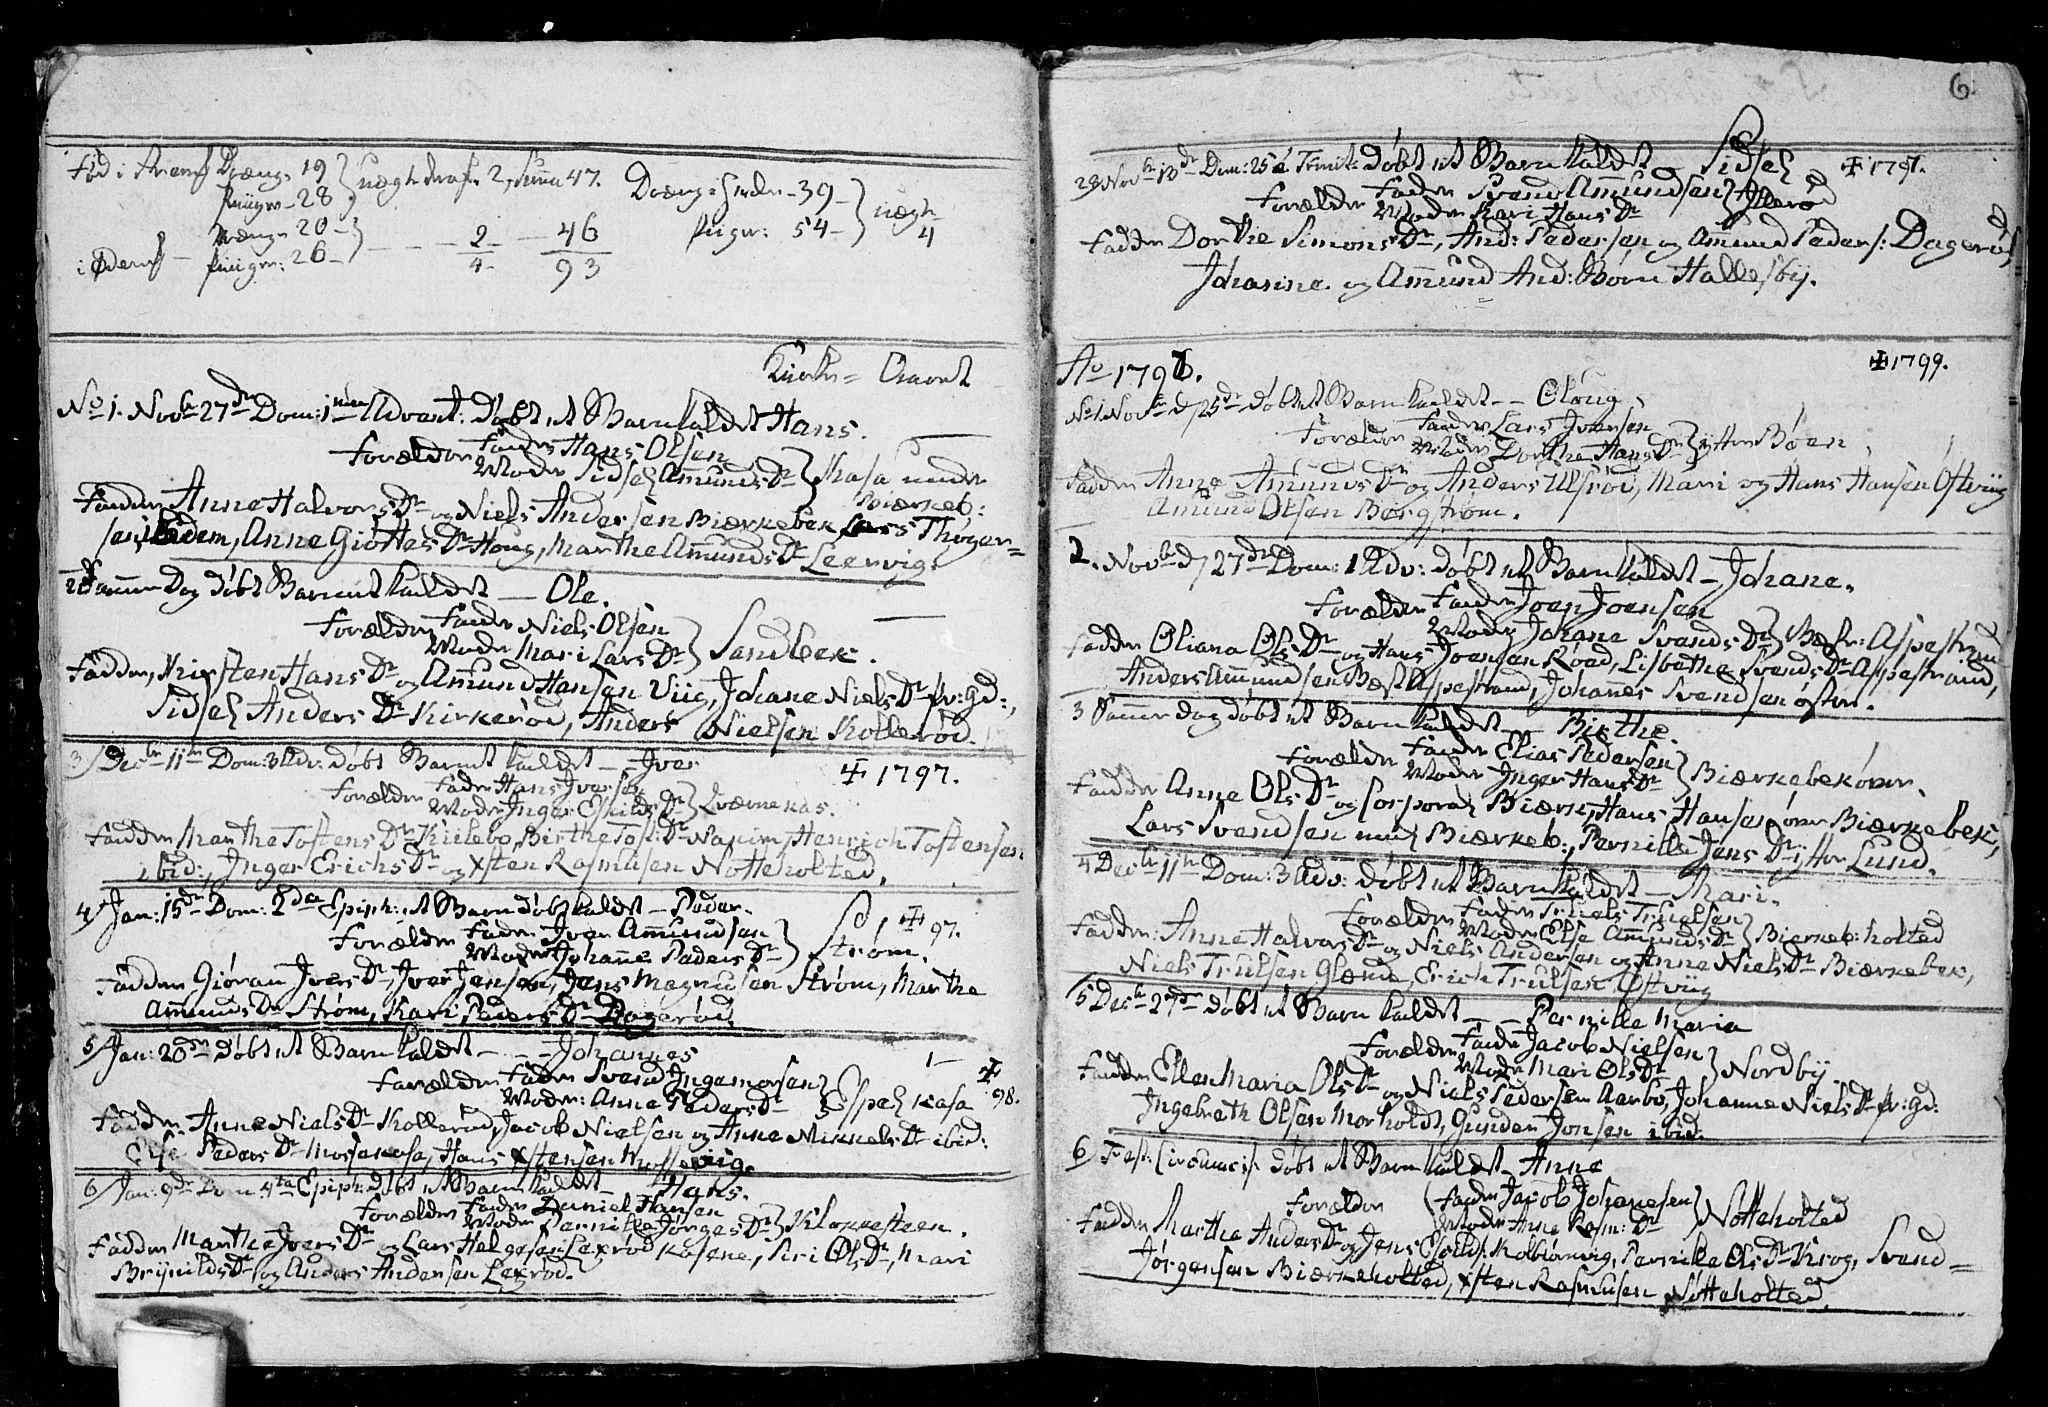 SAO, Aremark prestekontor Kirkebøker, F/Fa/L0004: Ministerialbok nr. I 4, 1796-1814, s. 6